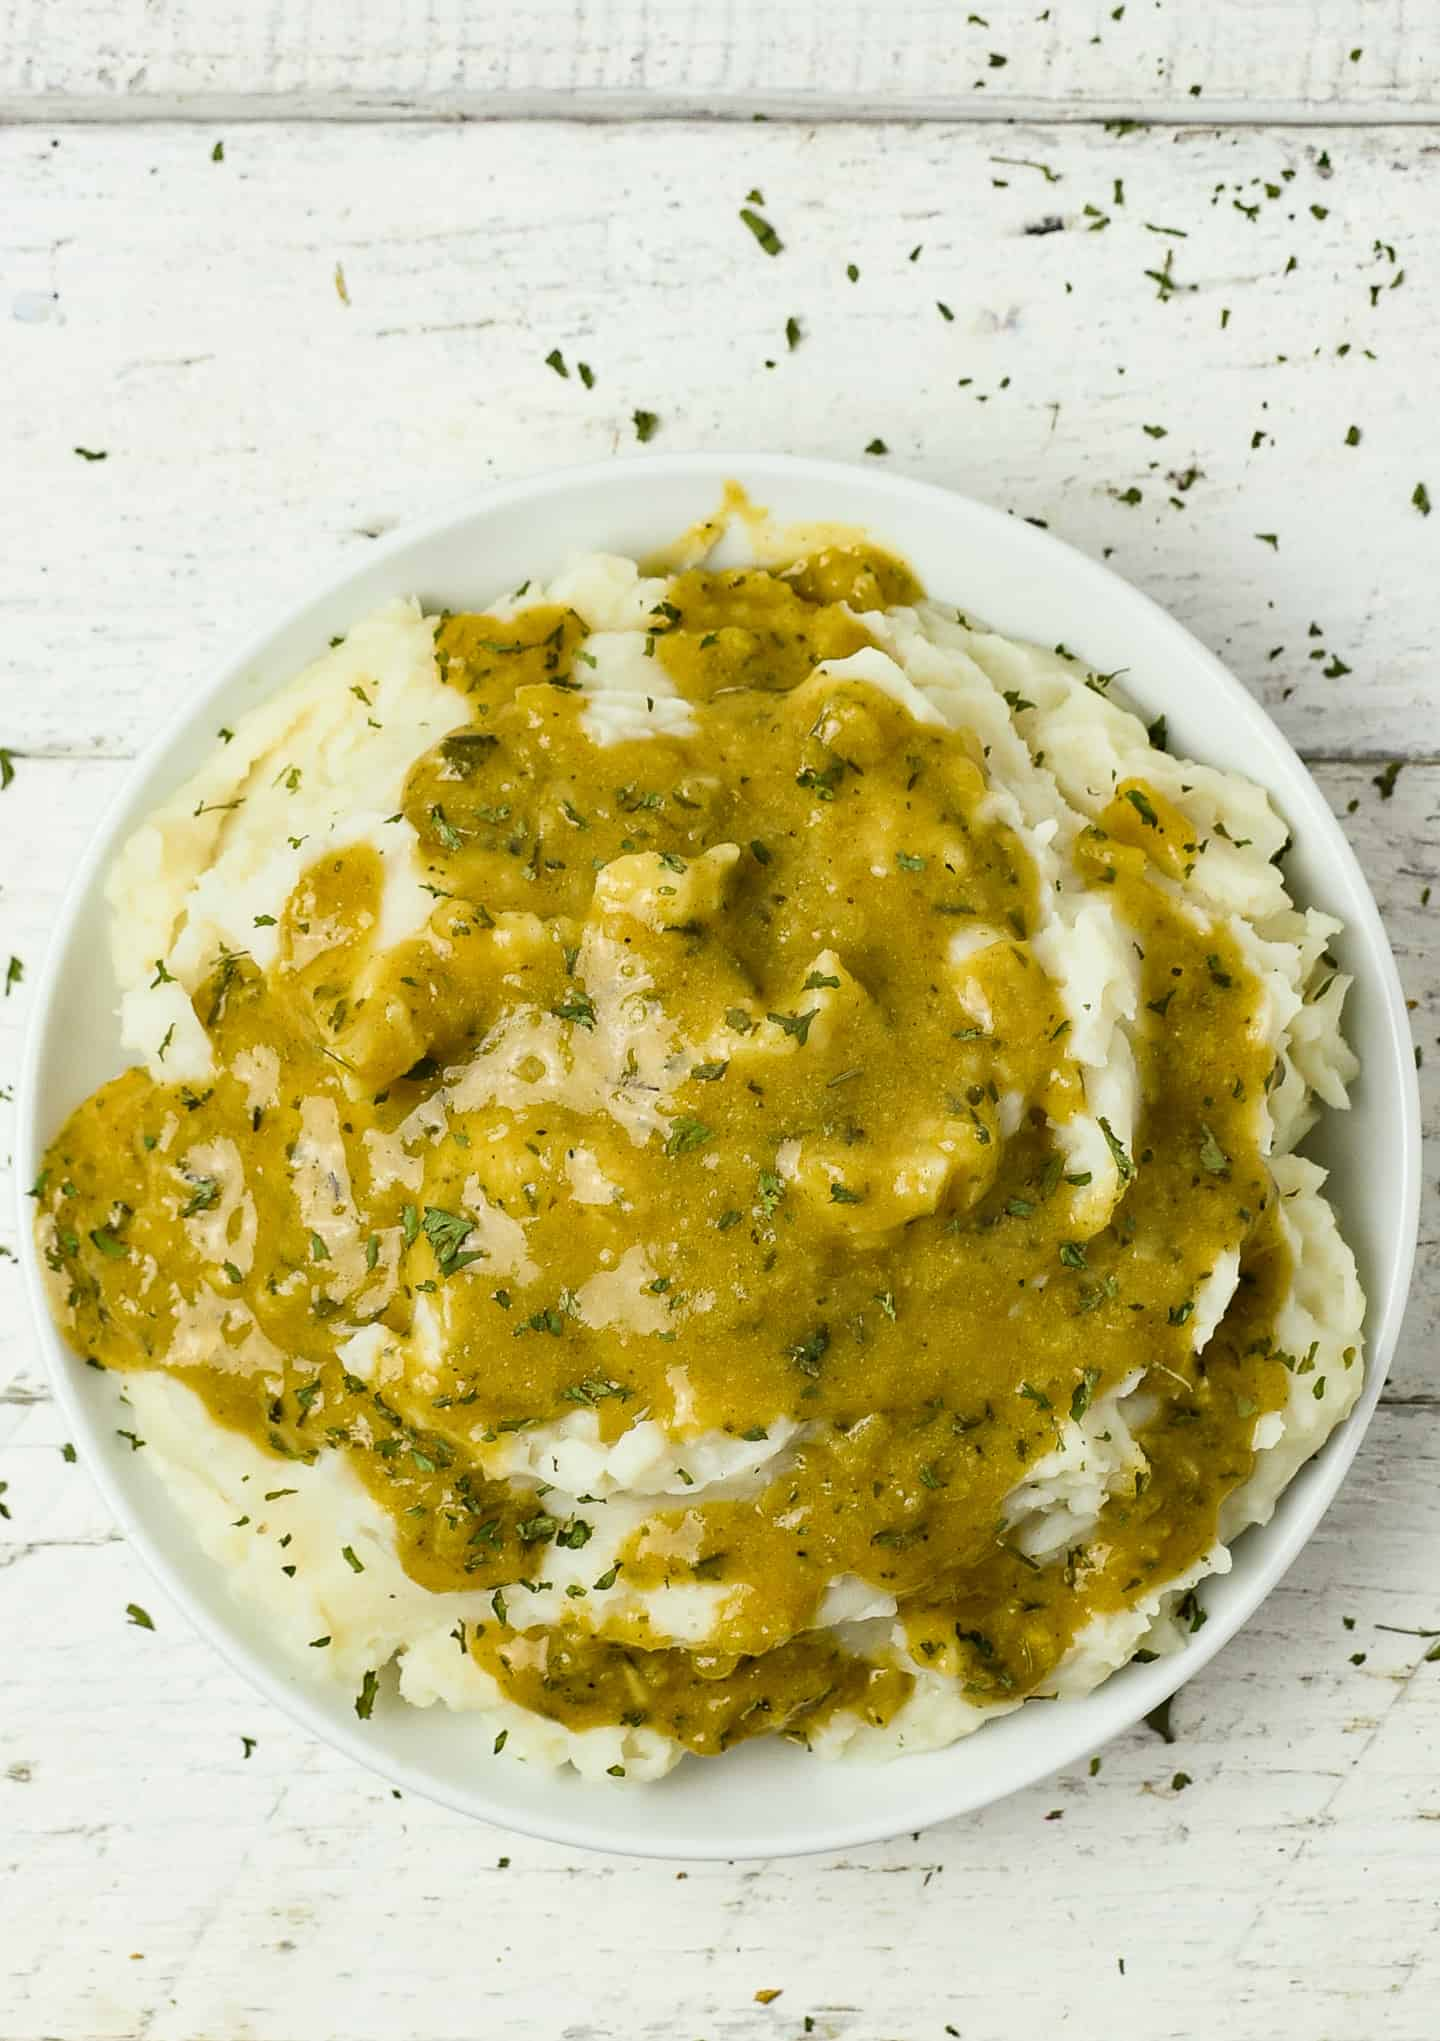 Vegan gravy over mashed potatoes.